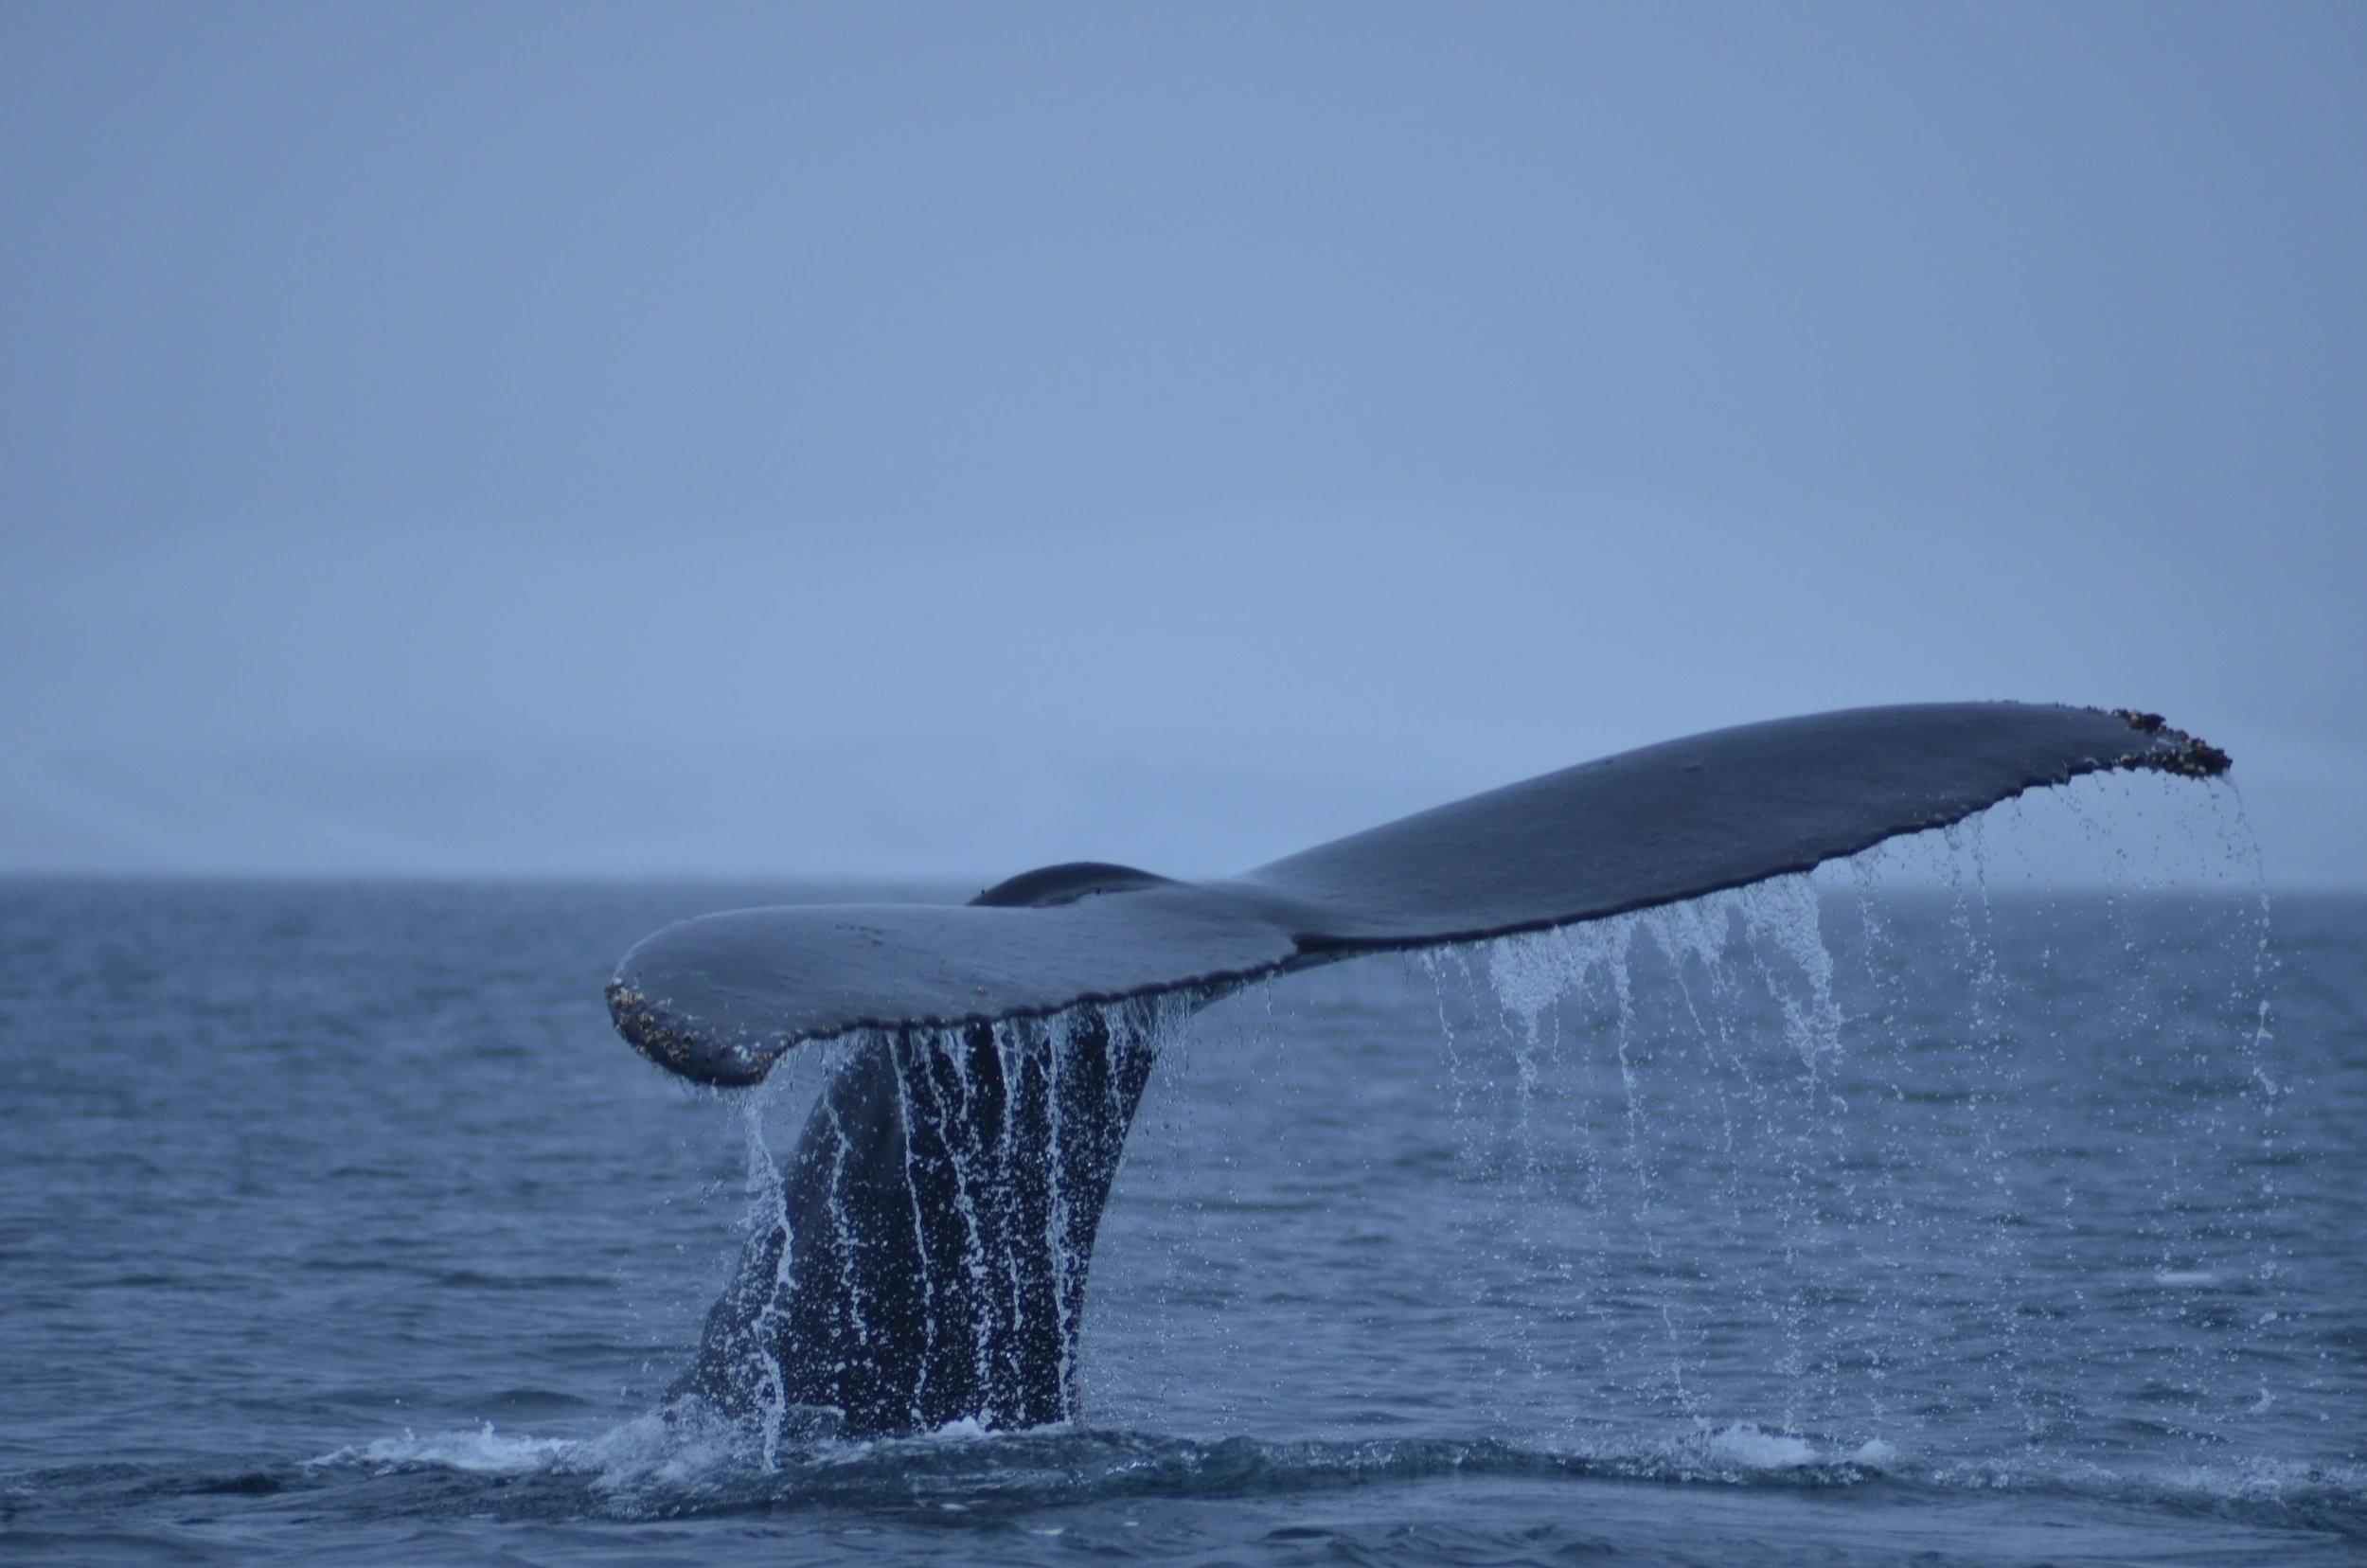 Antarctica_SharedPhotos_20130119_094247_083.jpg